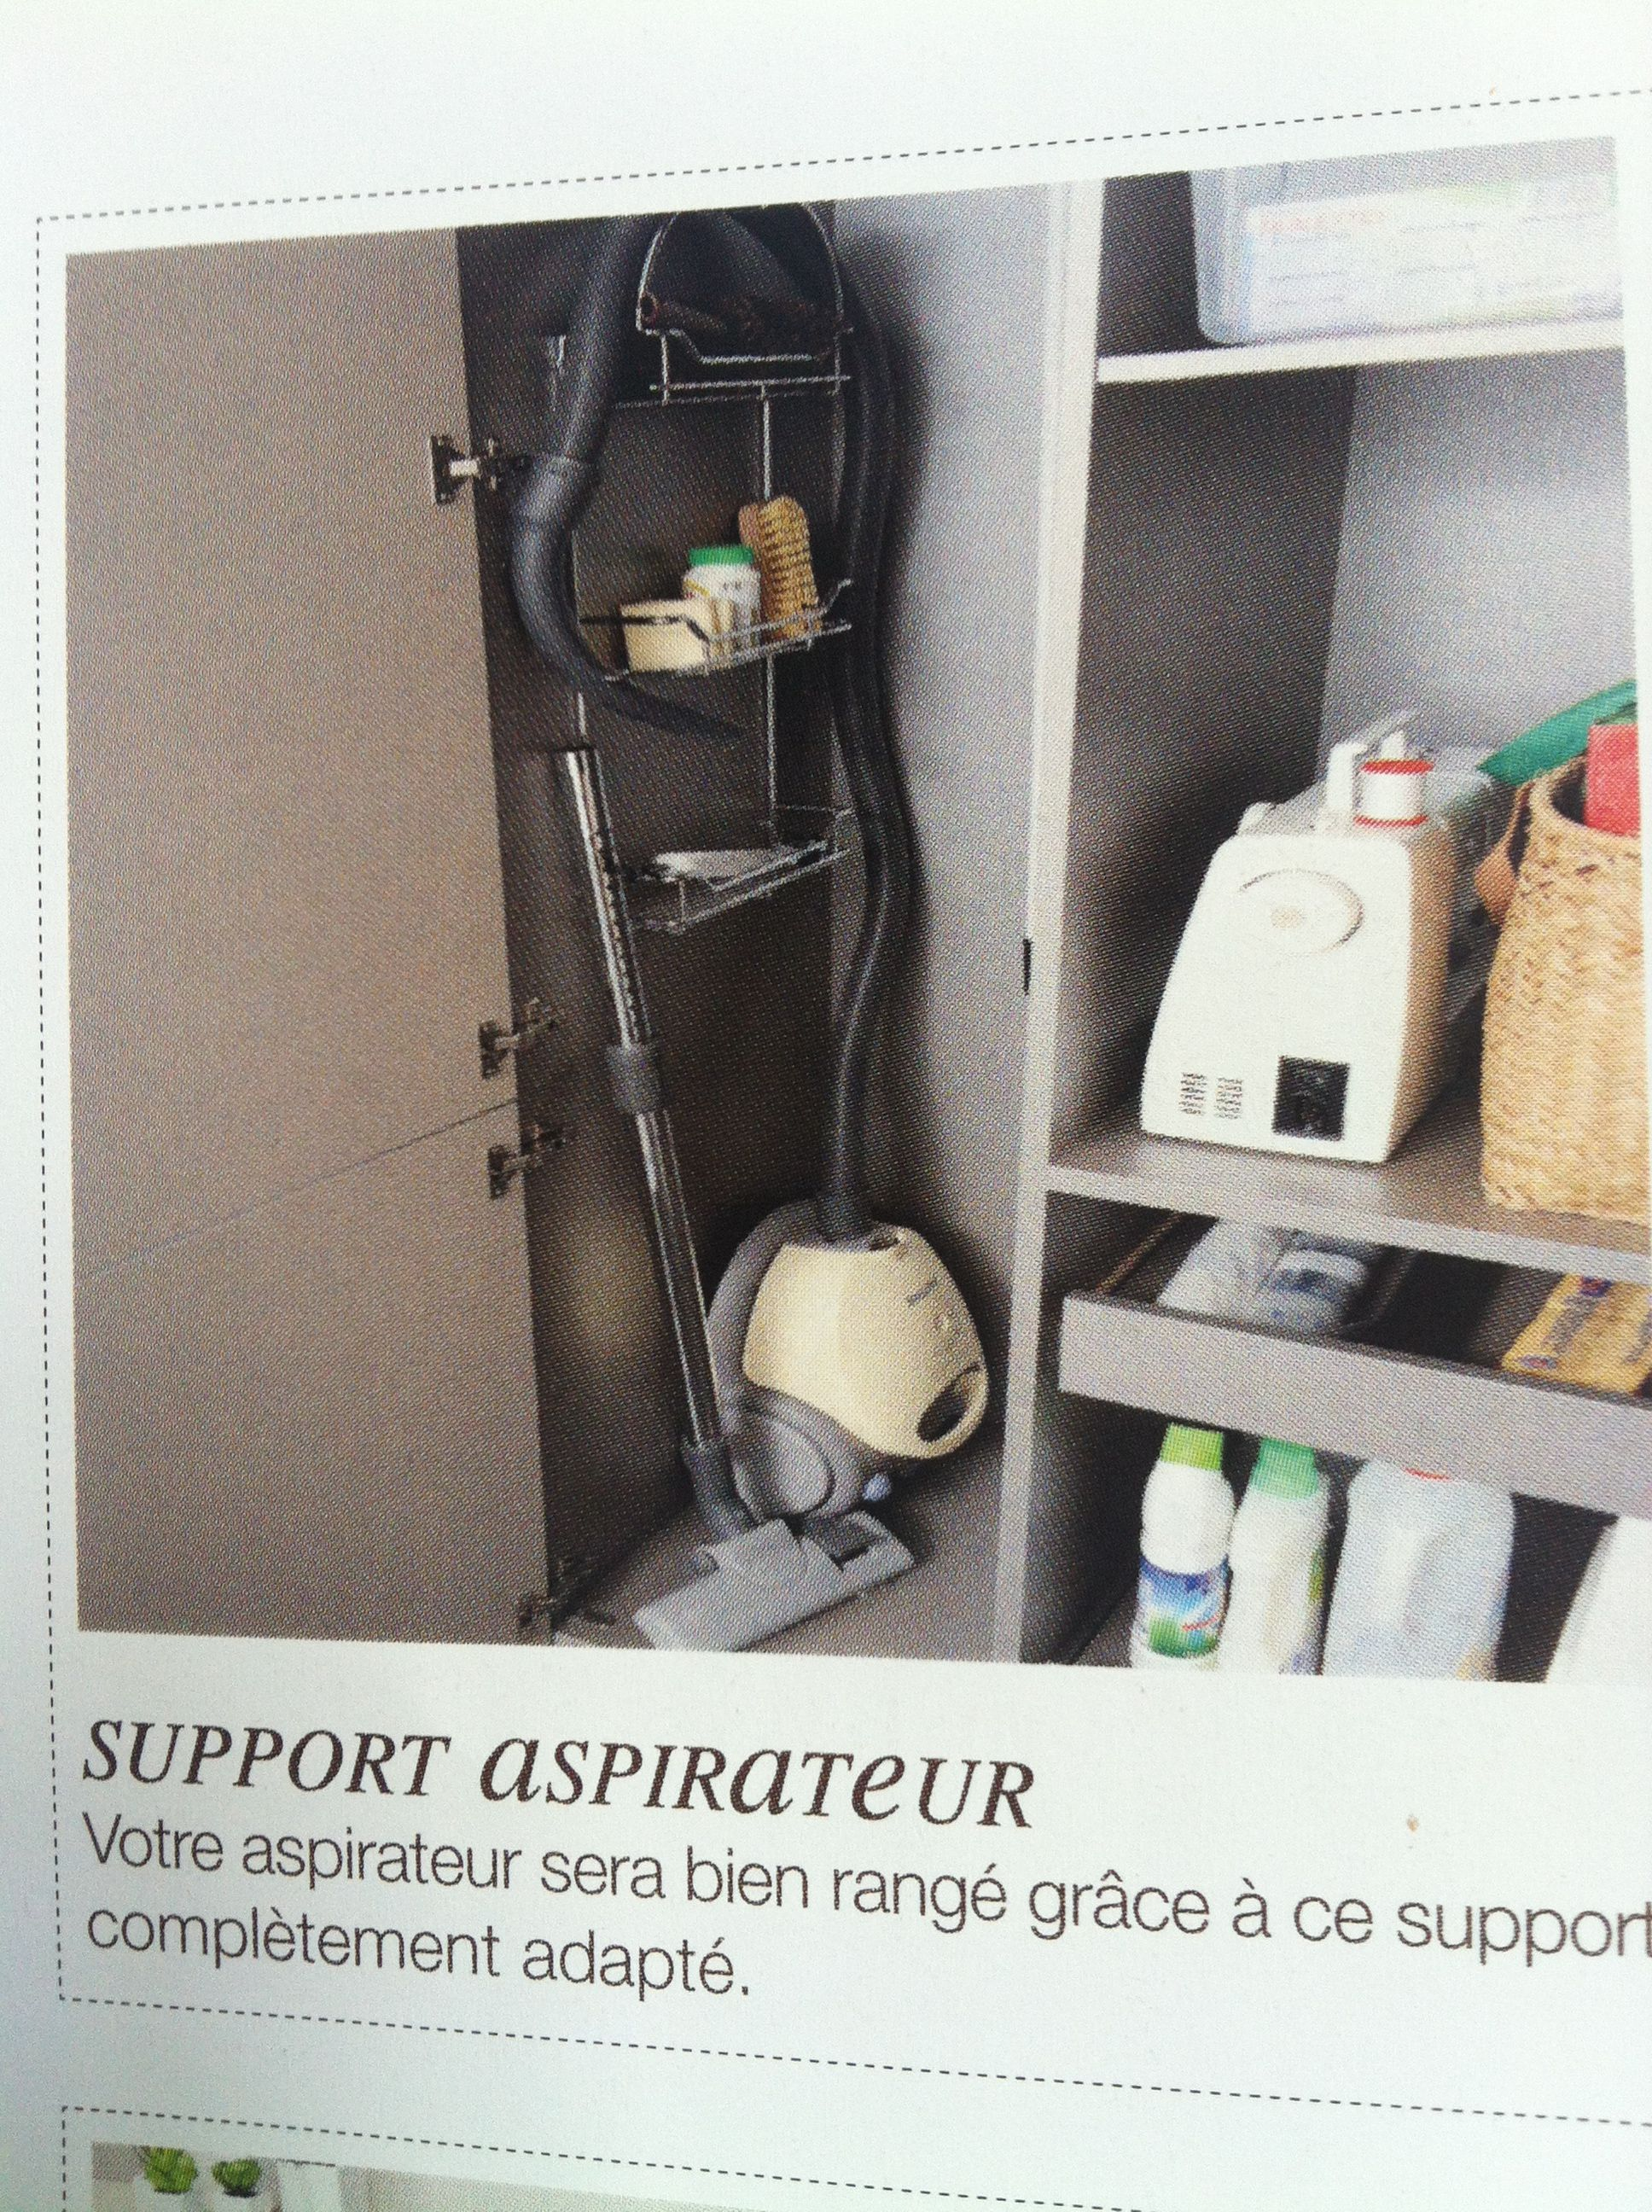 rangement aspirateur placard pinterest rangement aspirateur aspirateurs et rangement. Black Bedroom Furniture Sets. Home Design Ideas